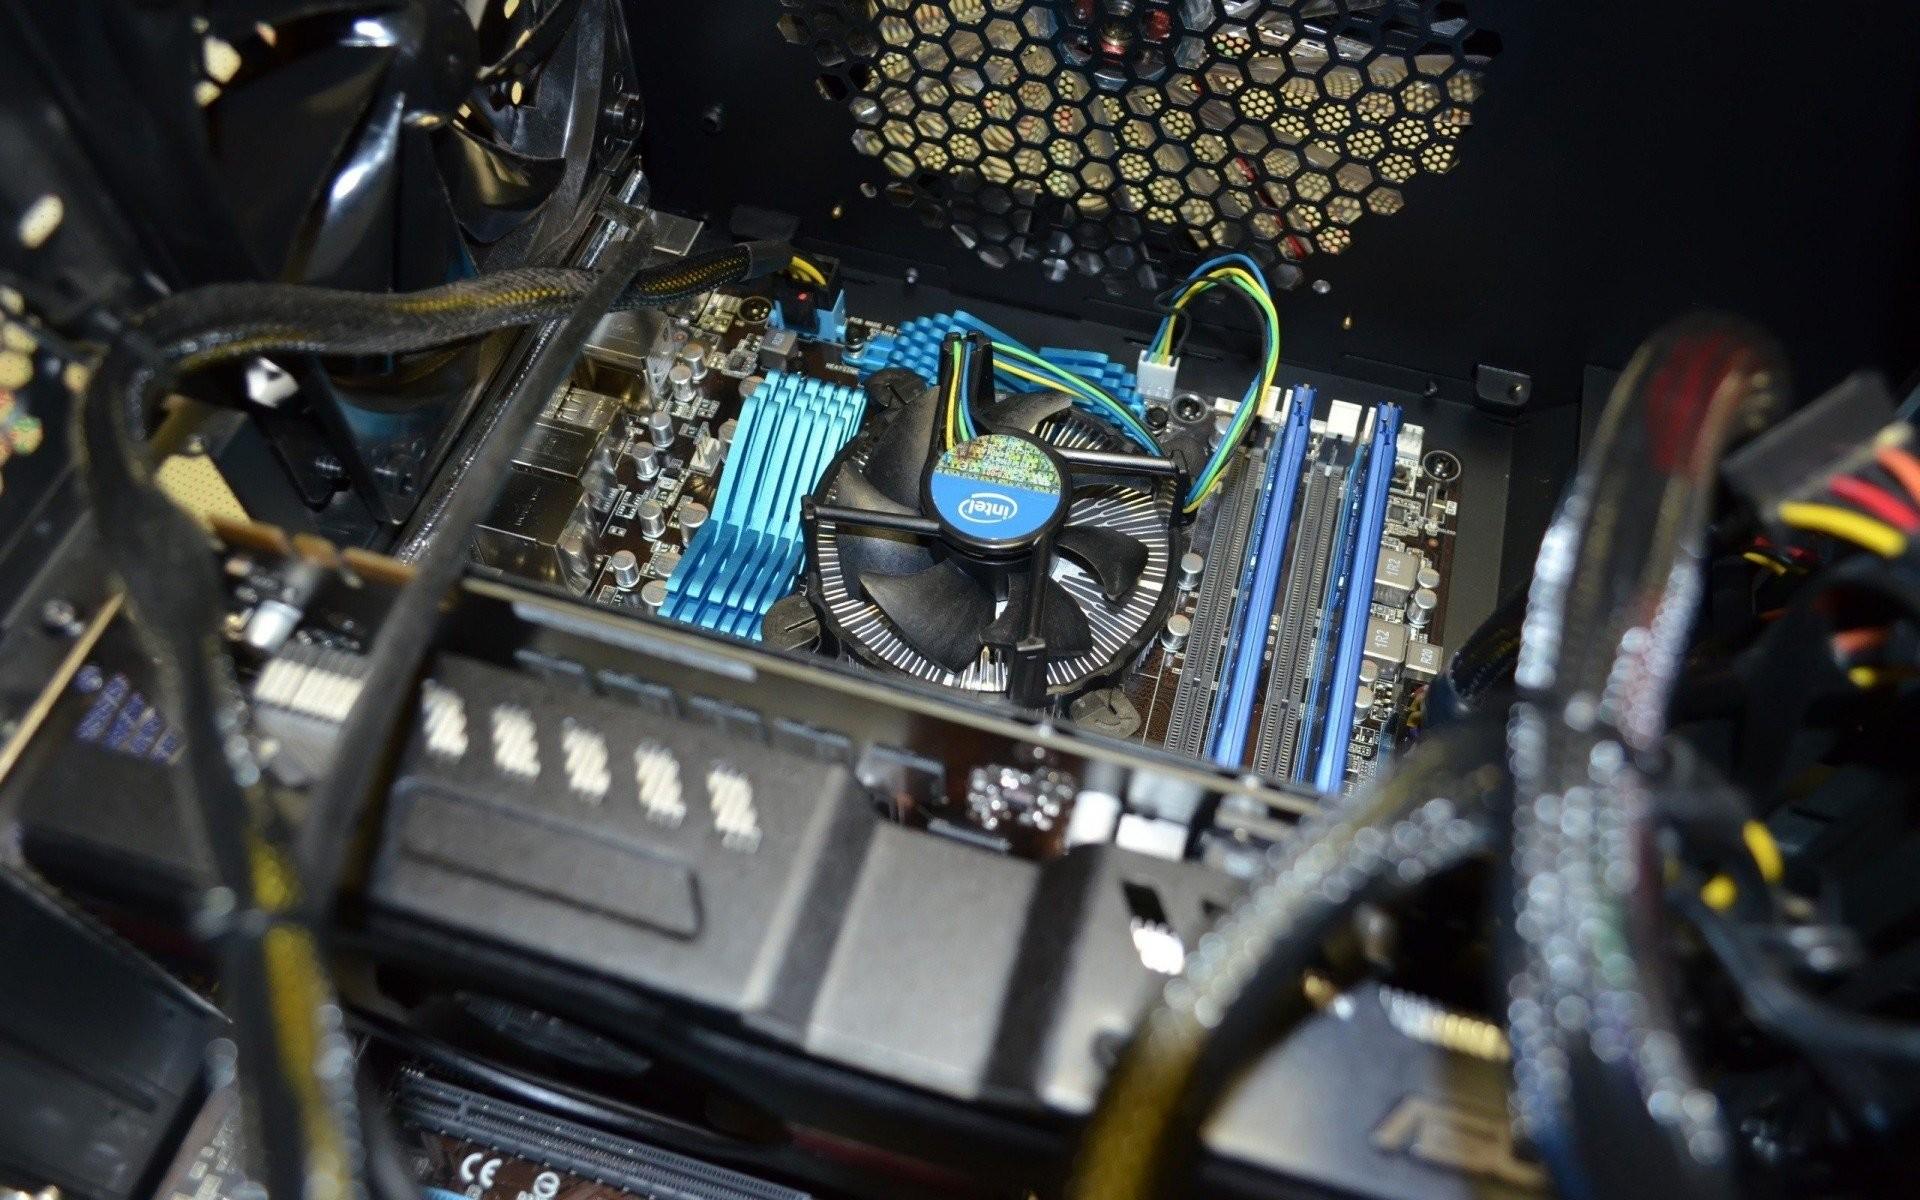 Res: 1920x1200, Intel HD Images ID: PZ83